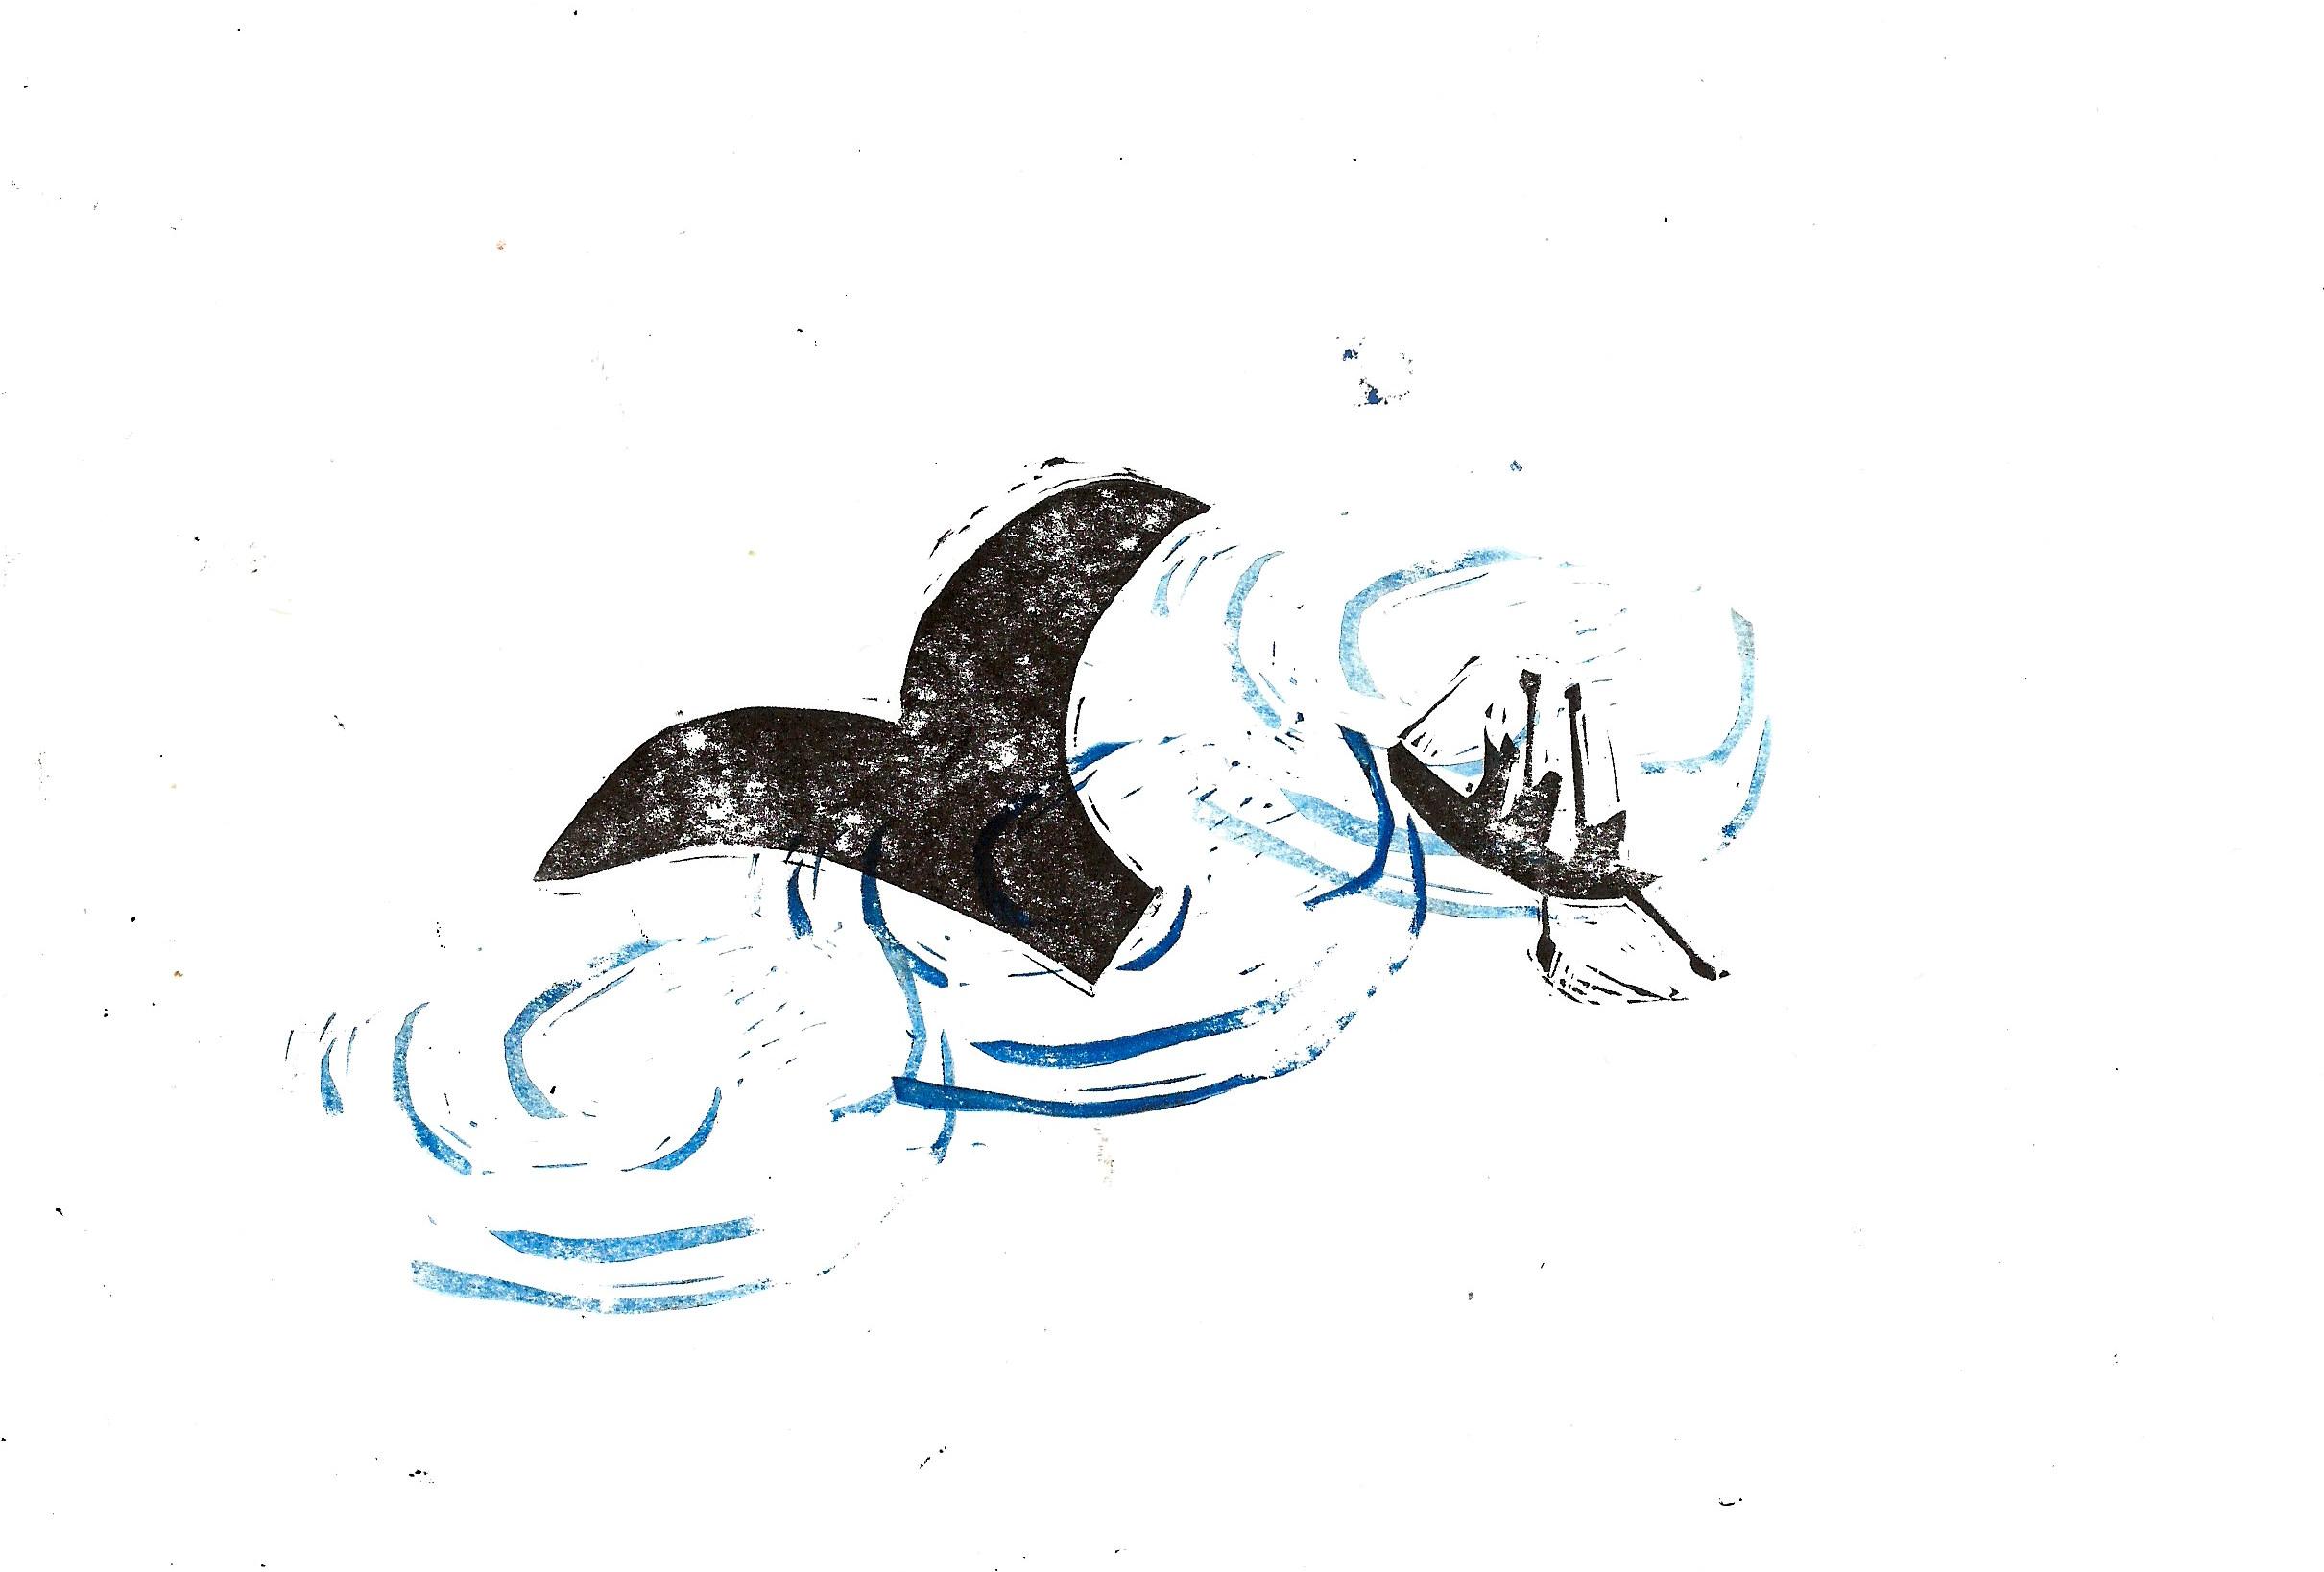 VictoriaWillmott whale 3.jpeg